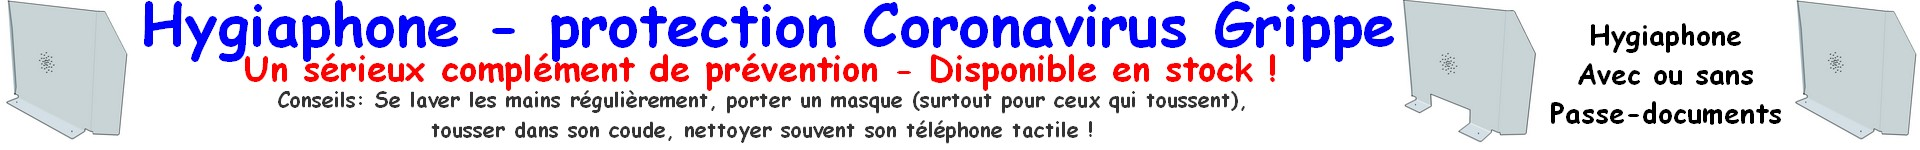 hygiaphone coronavirus covid-19 grippe anti-virus prévention épidémie pandemie